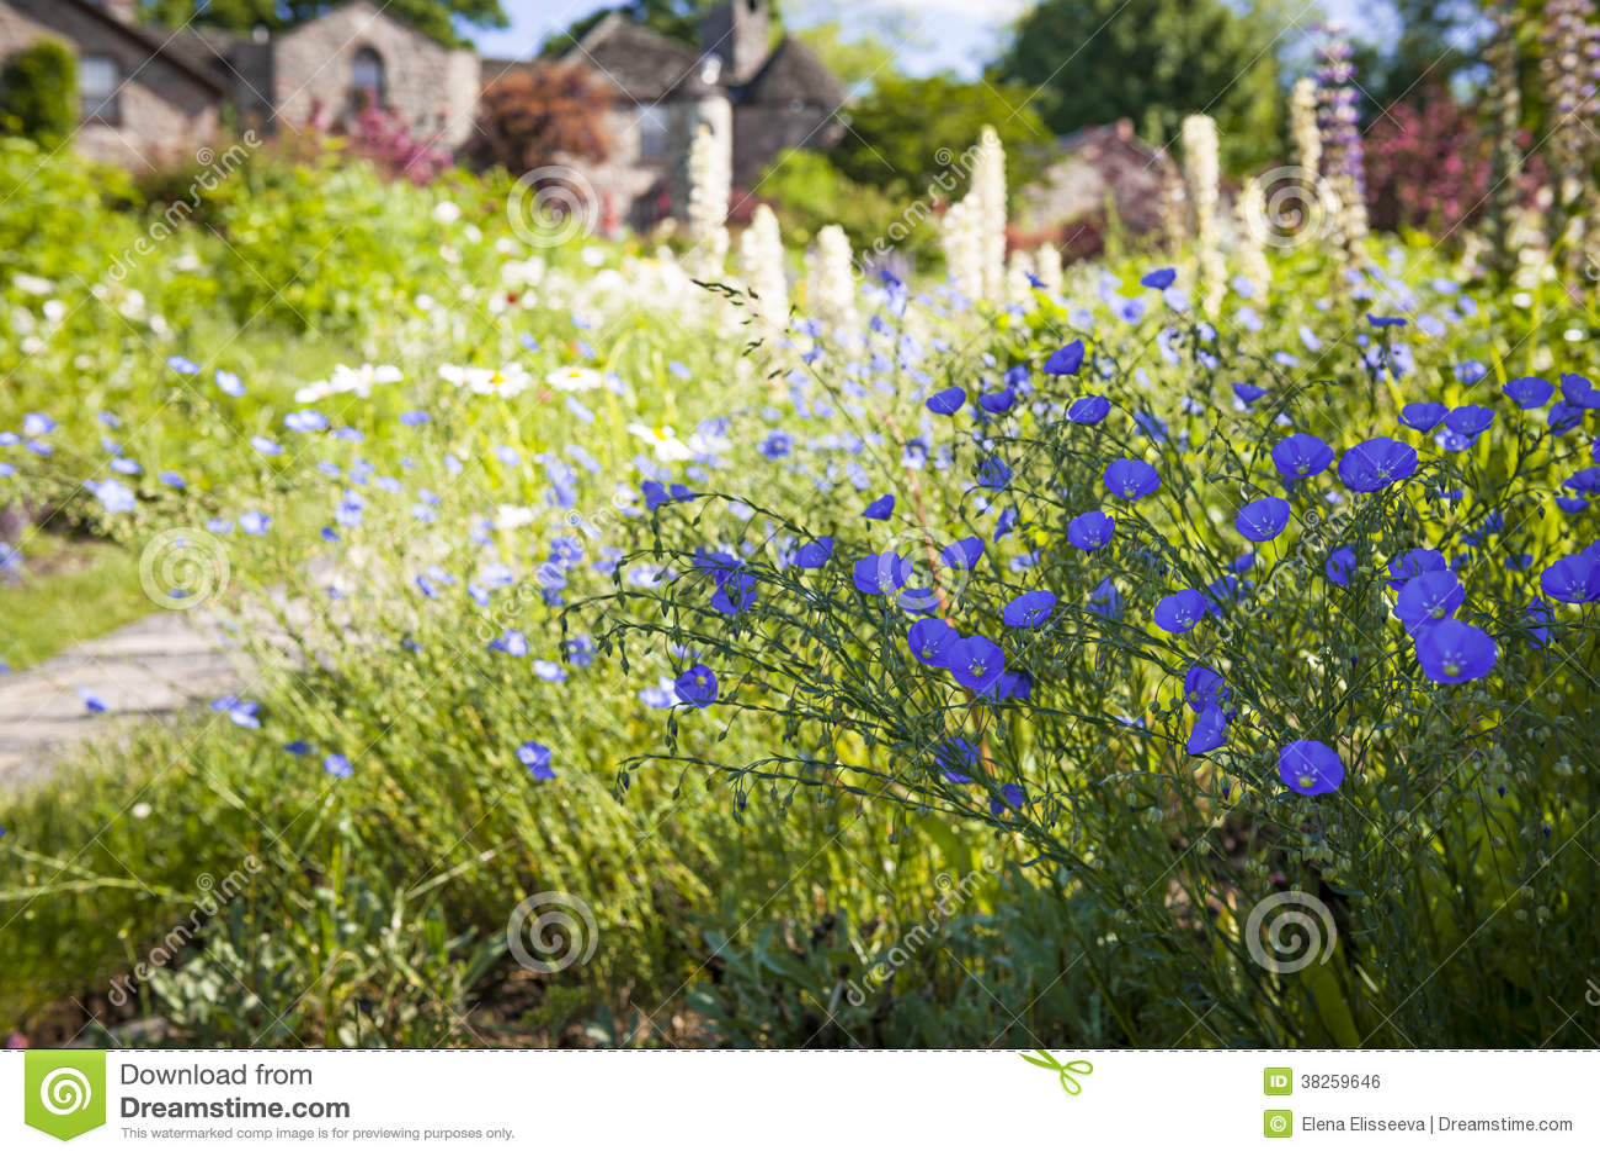 Fleurs jardin ete for Fleurs dans le jardin